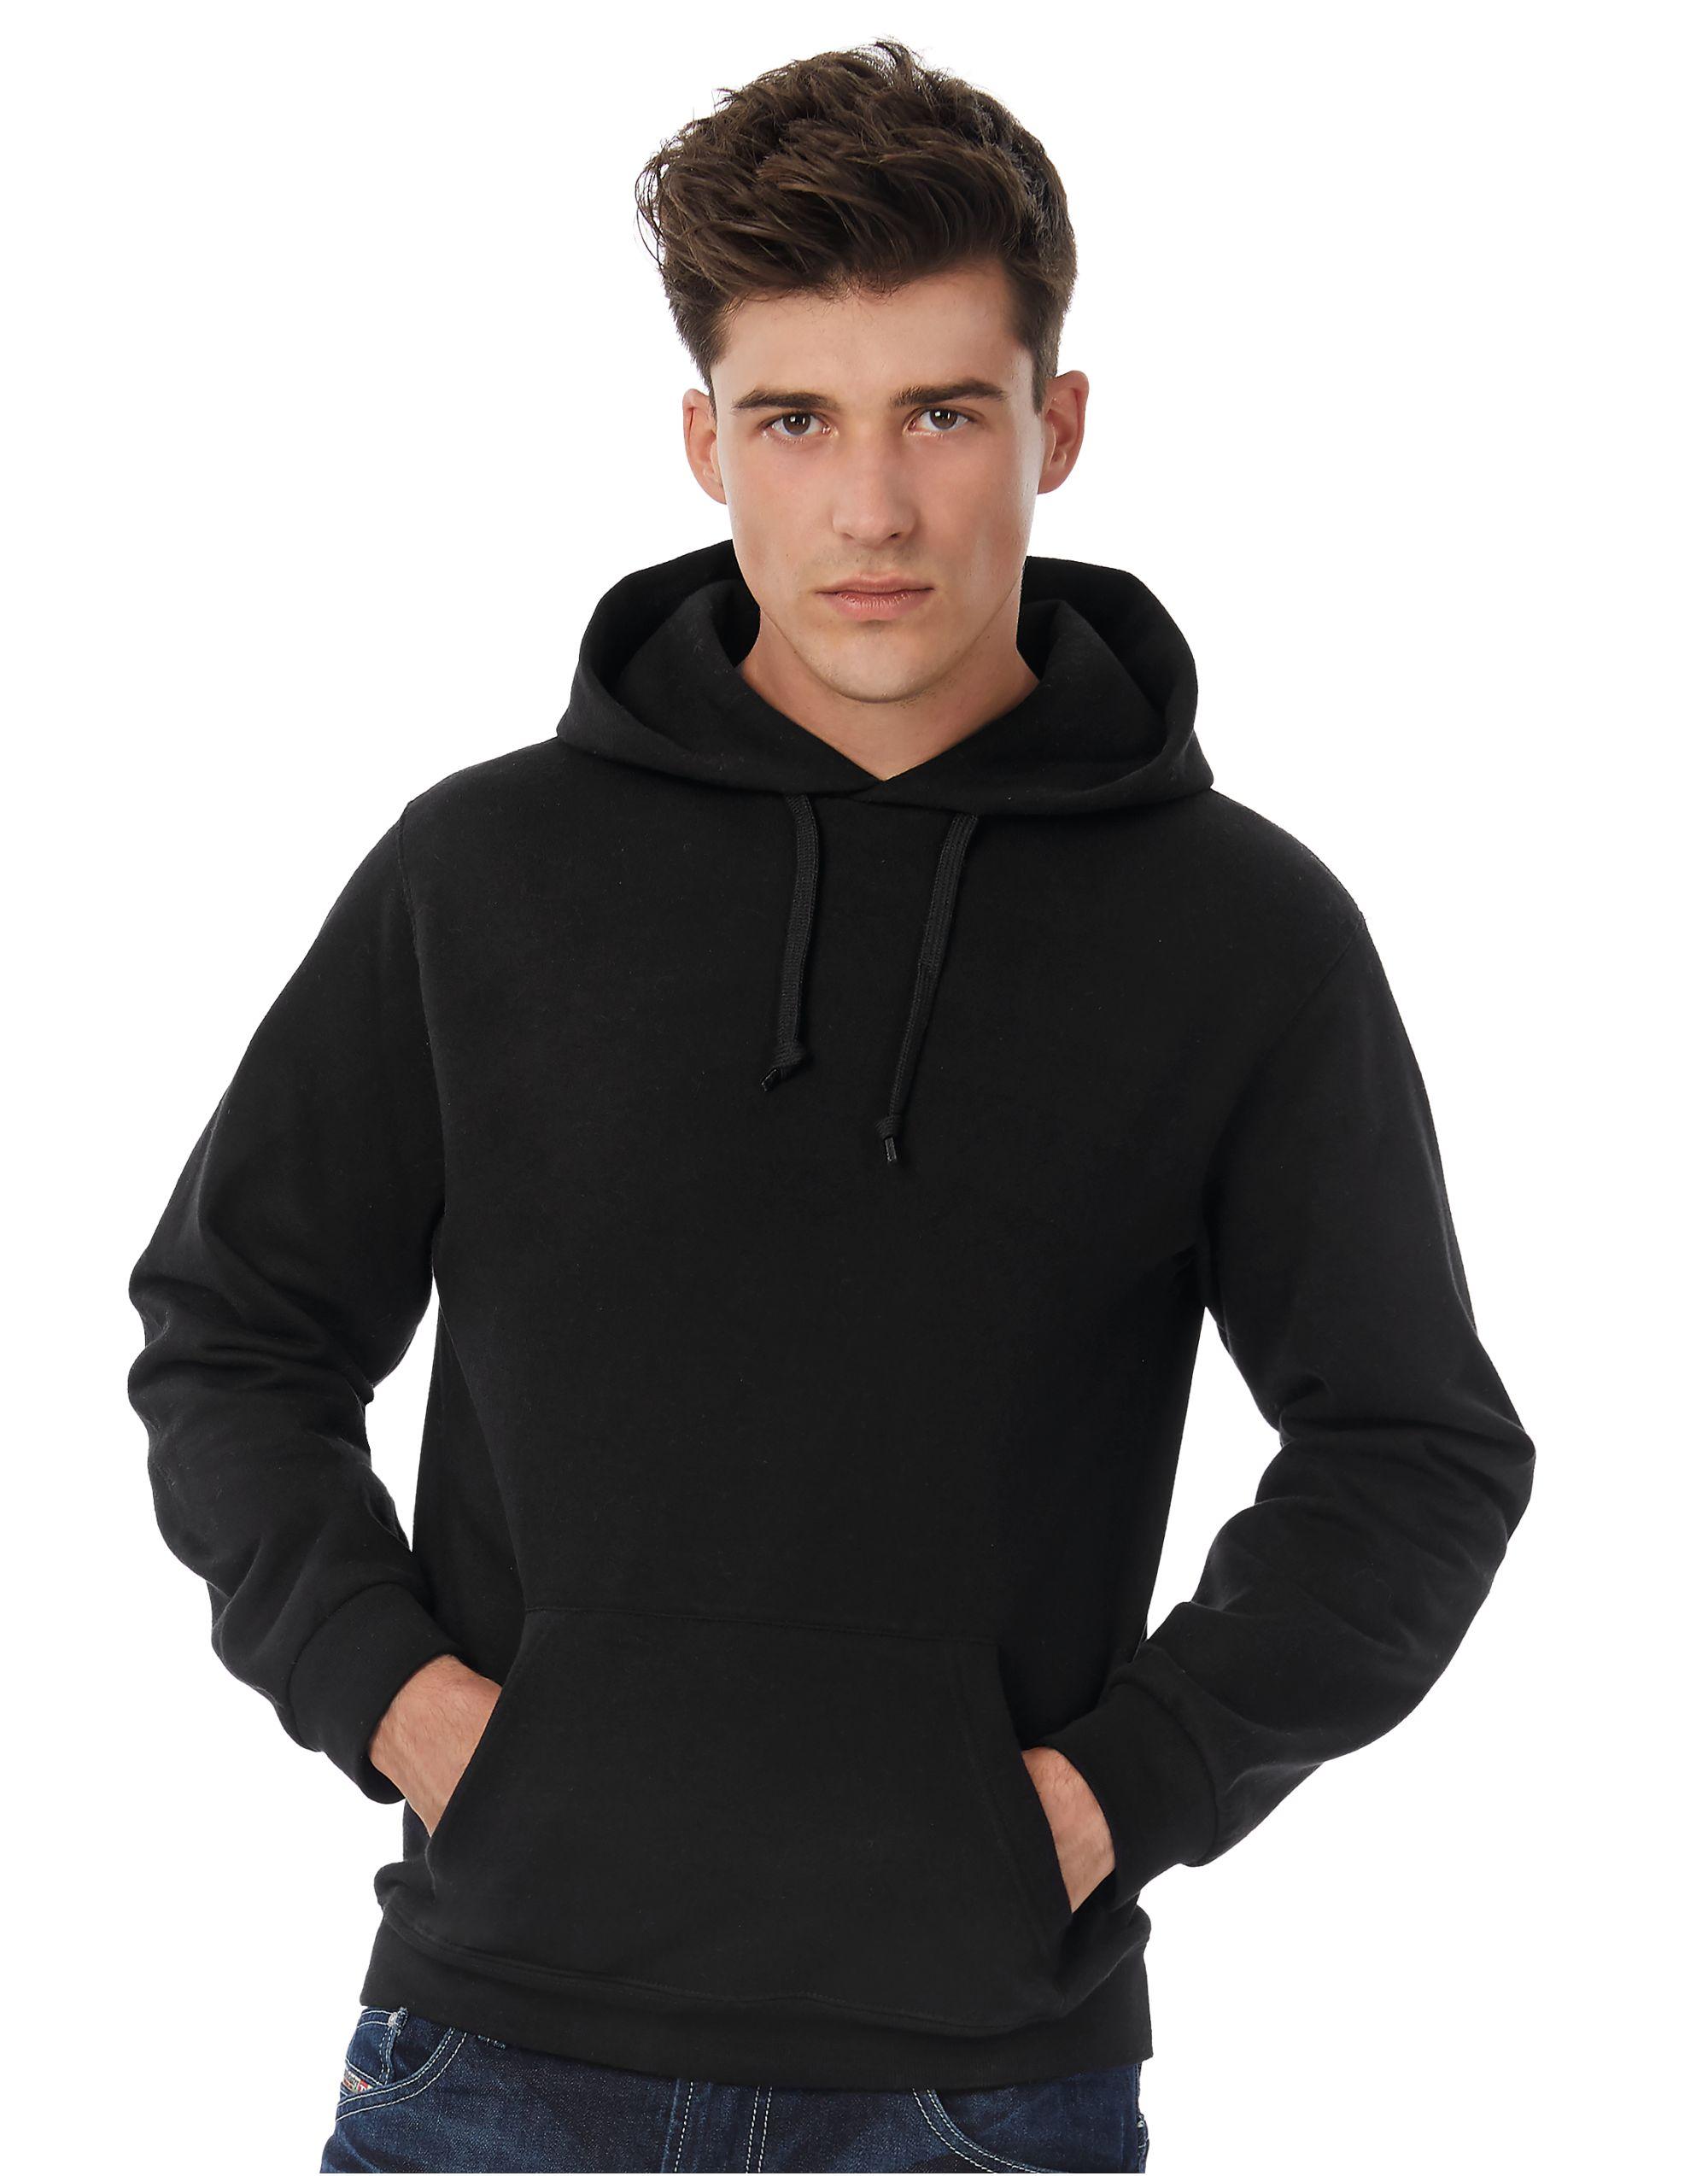 B&C ID.003 Cotton Rich Hooded Sweatshirt